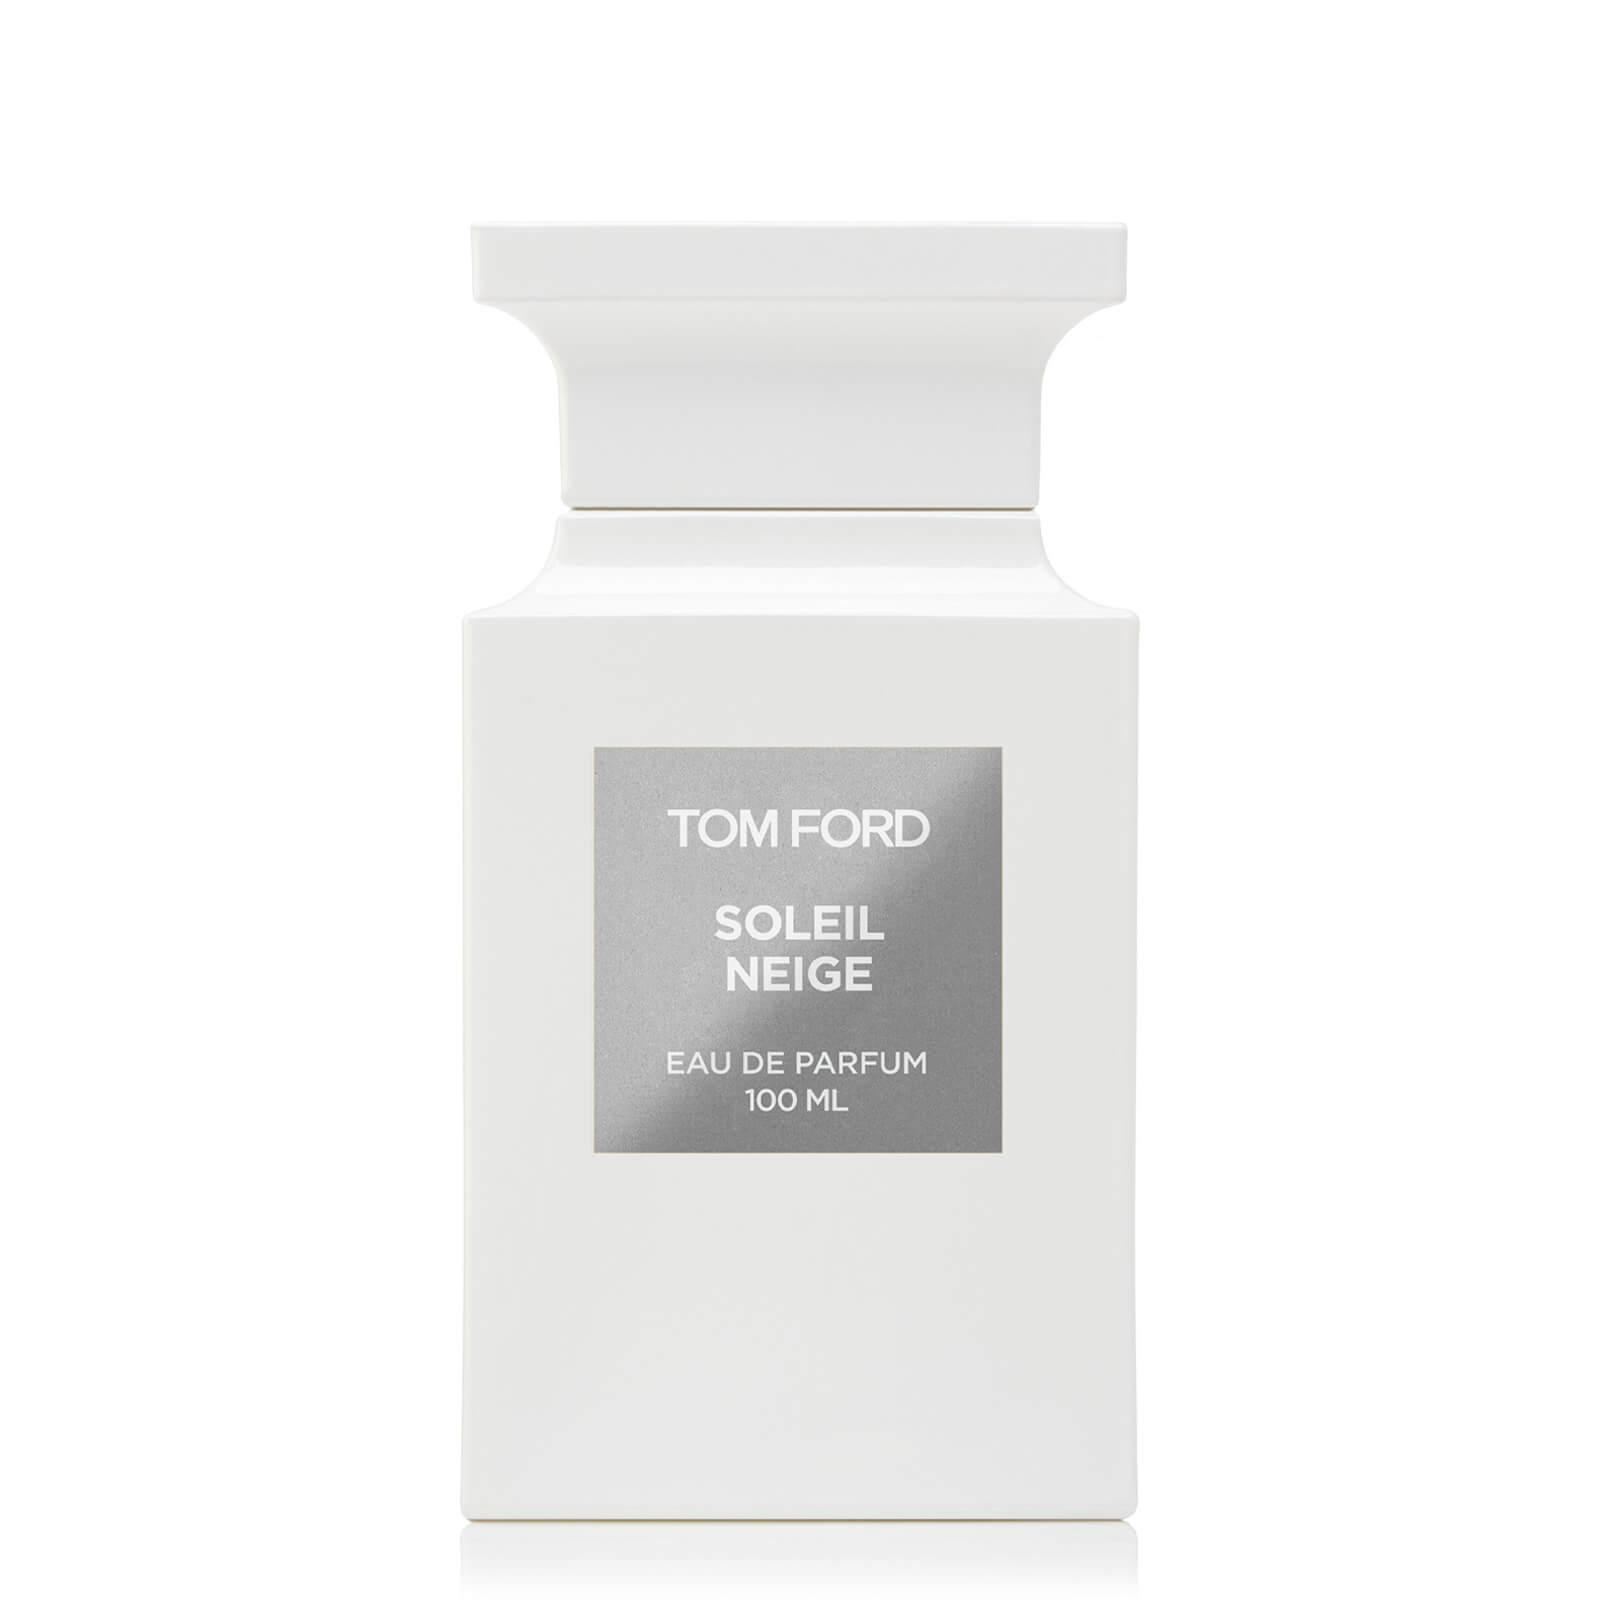 Tom Ford Soleil Neige Eau de Parfum Spray (Various Sizes) - 100ml